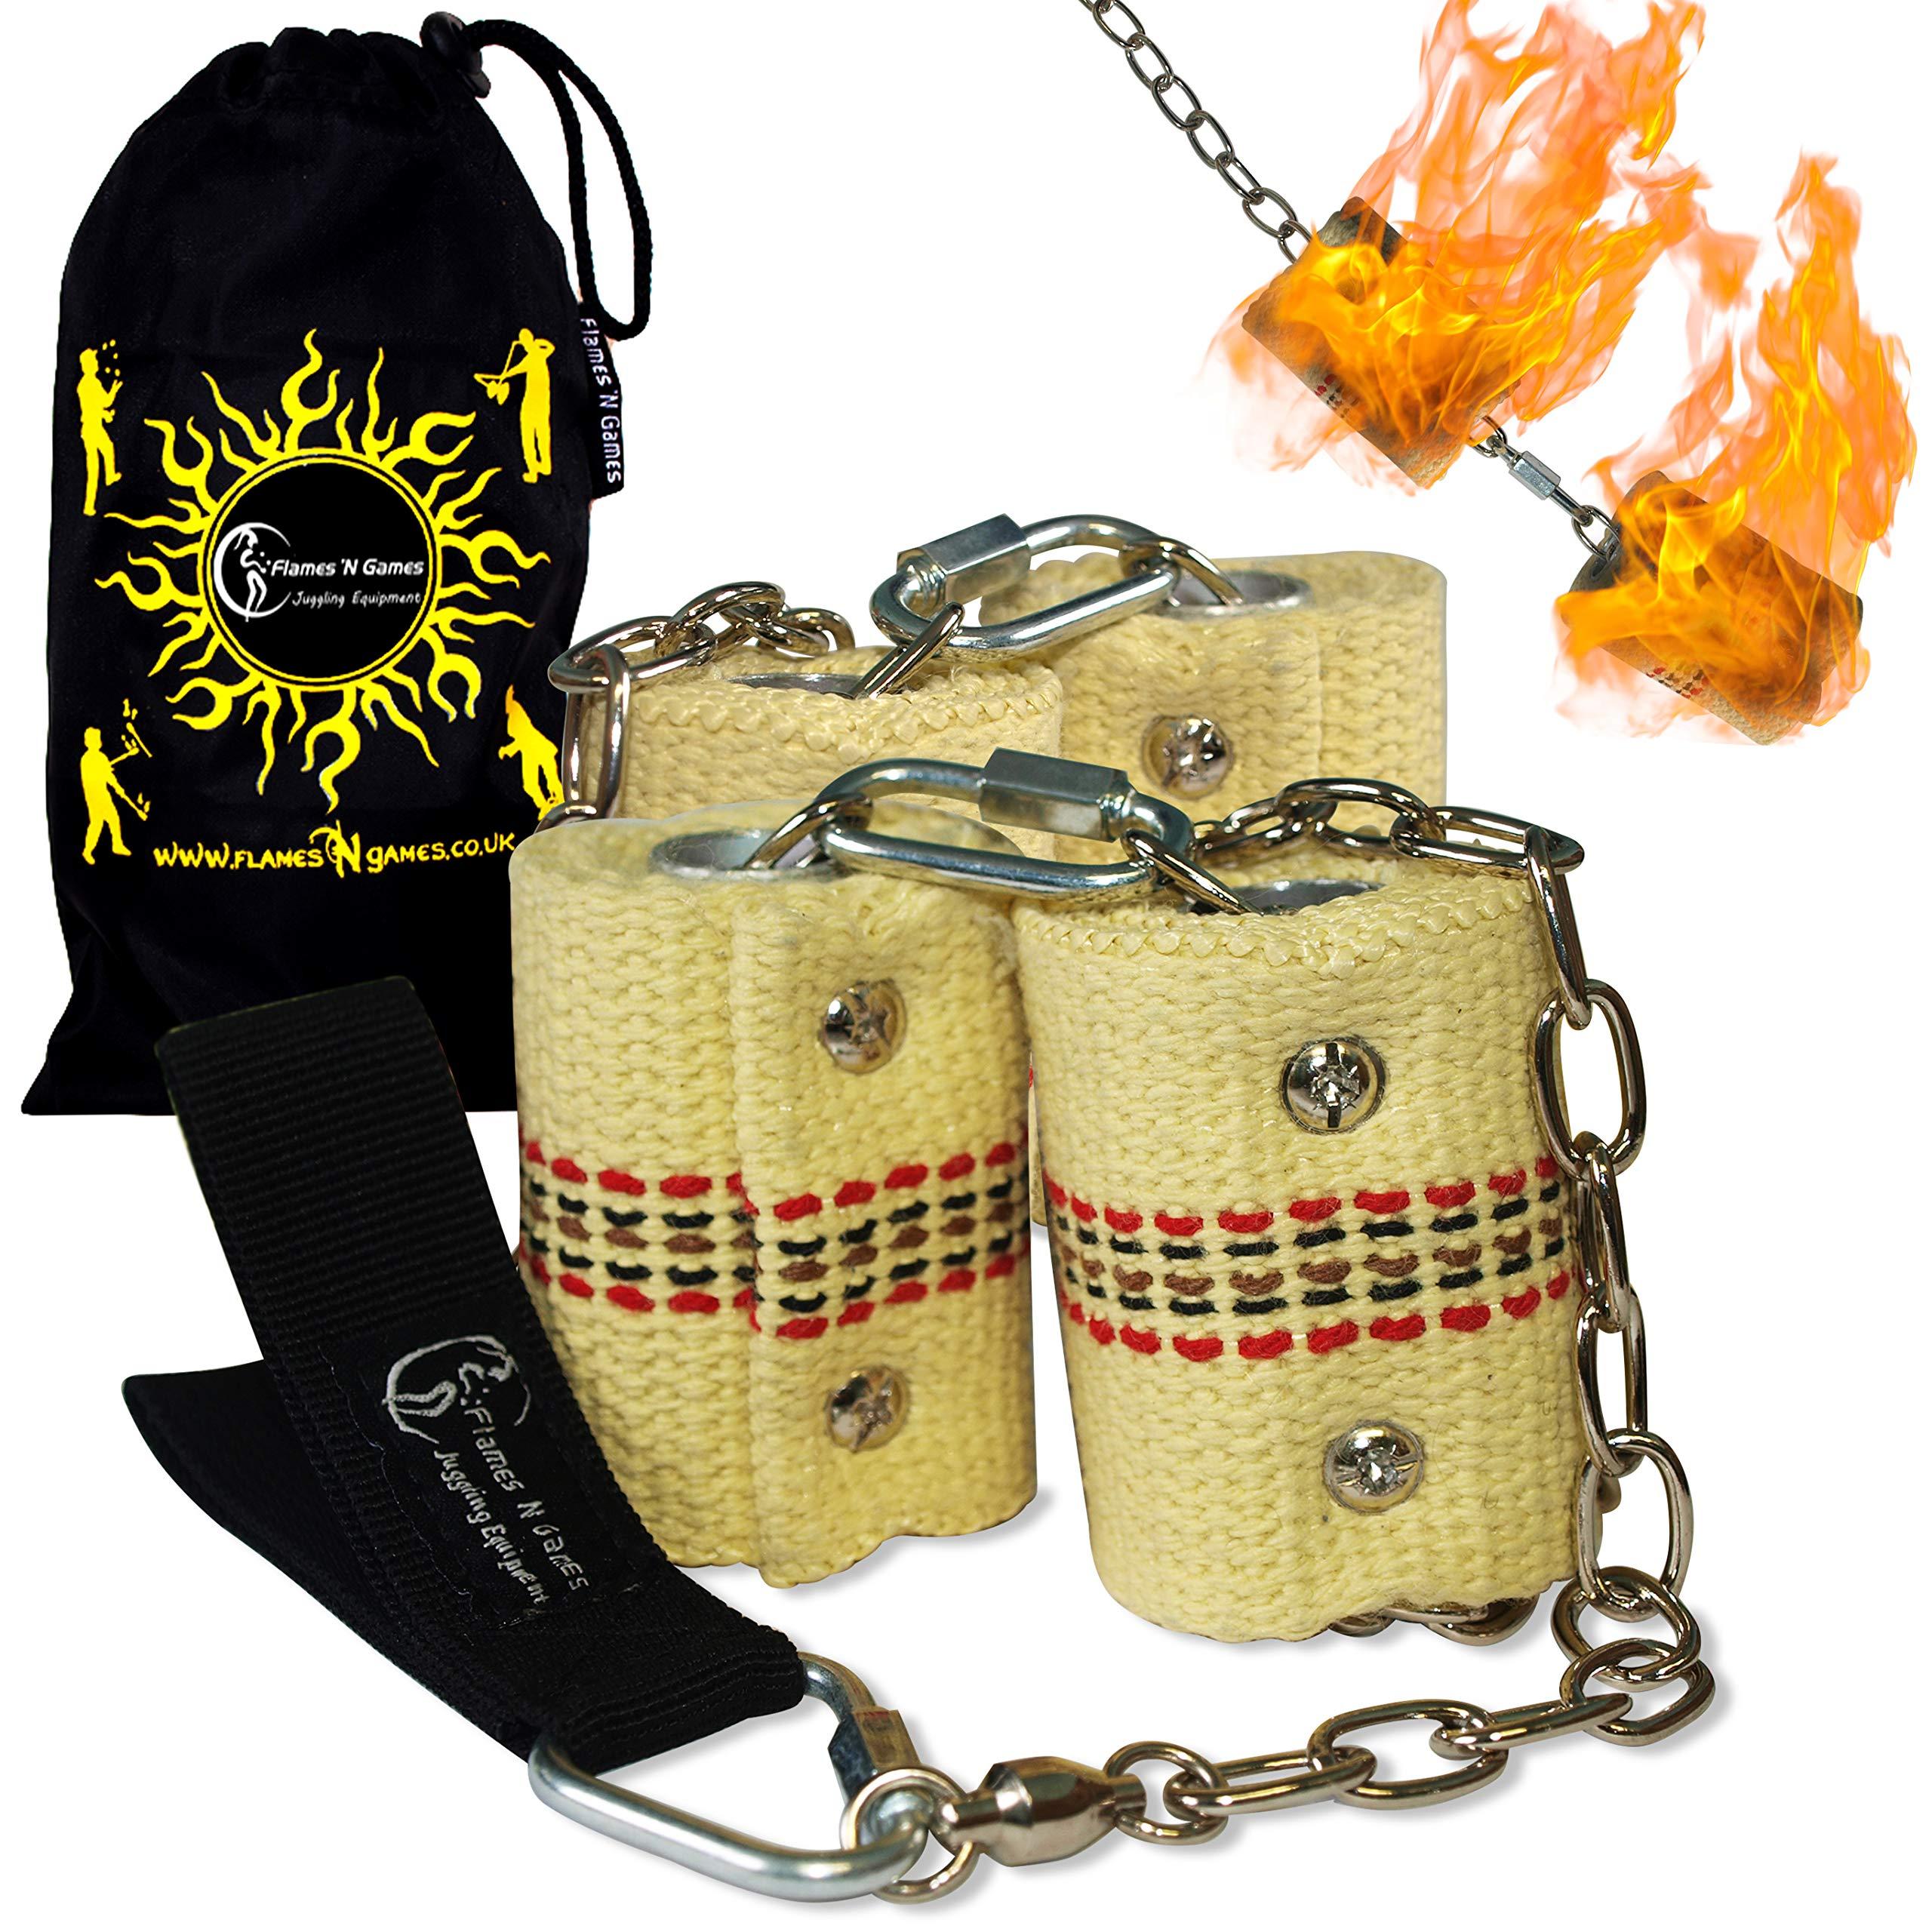 Pro Fire Poi Set - Double Burner - 4x65mm Wicks by Flames N Games + Travel Bag! by Flames 'N Games Poi (Image #3)